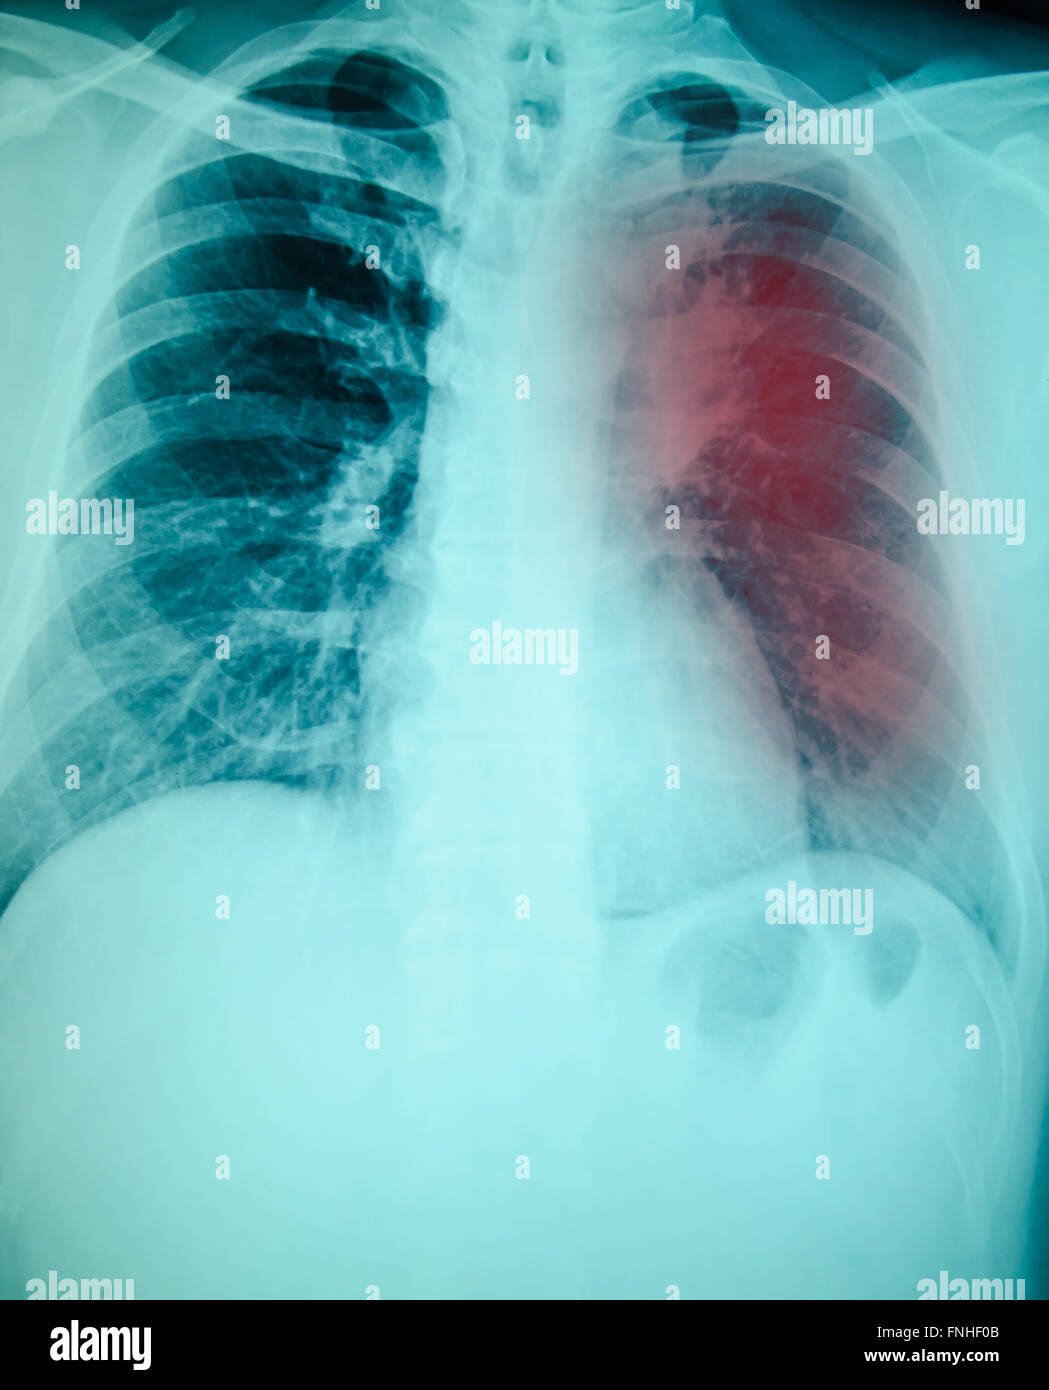 chest x-ray examination for diagnosis Pulmonary ...